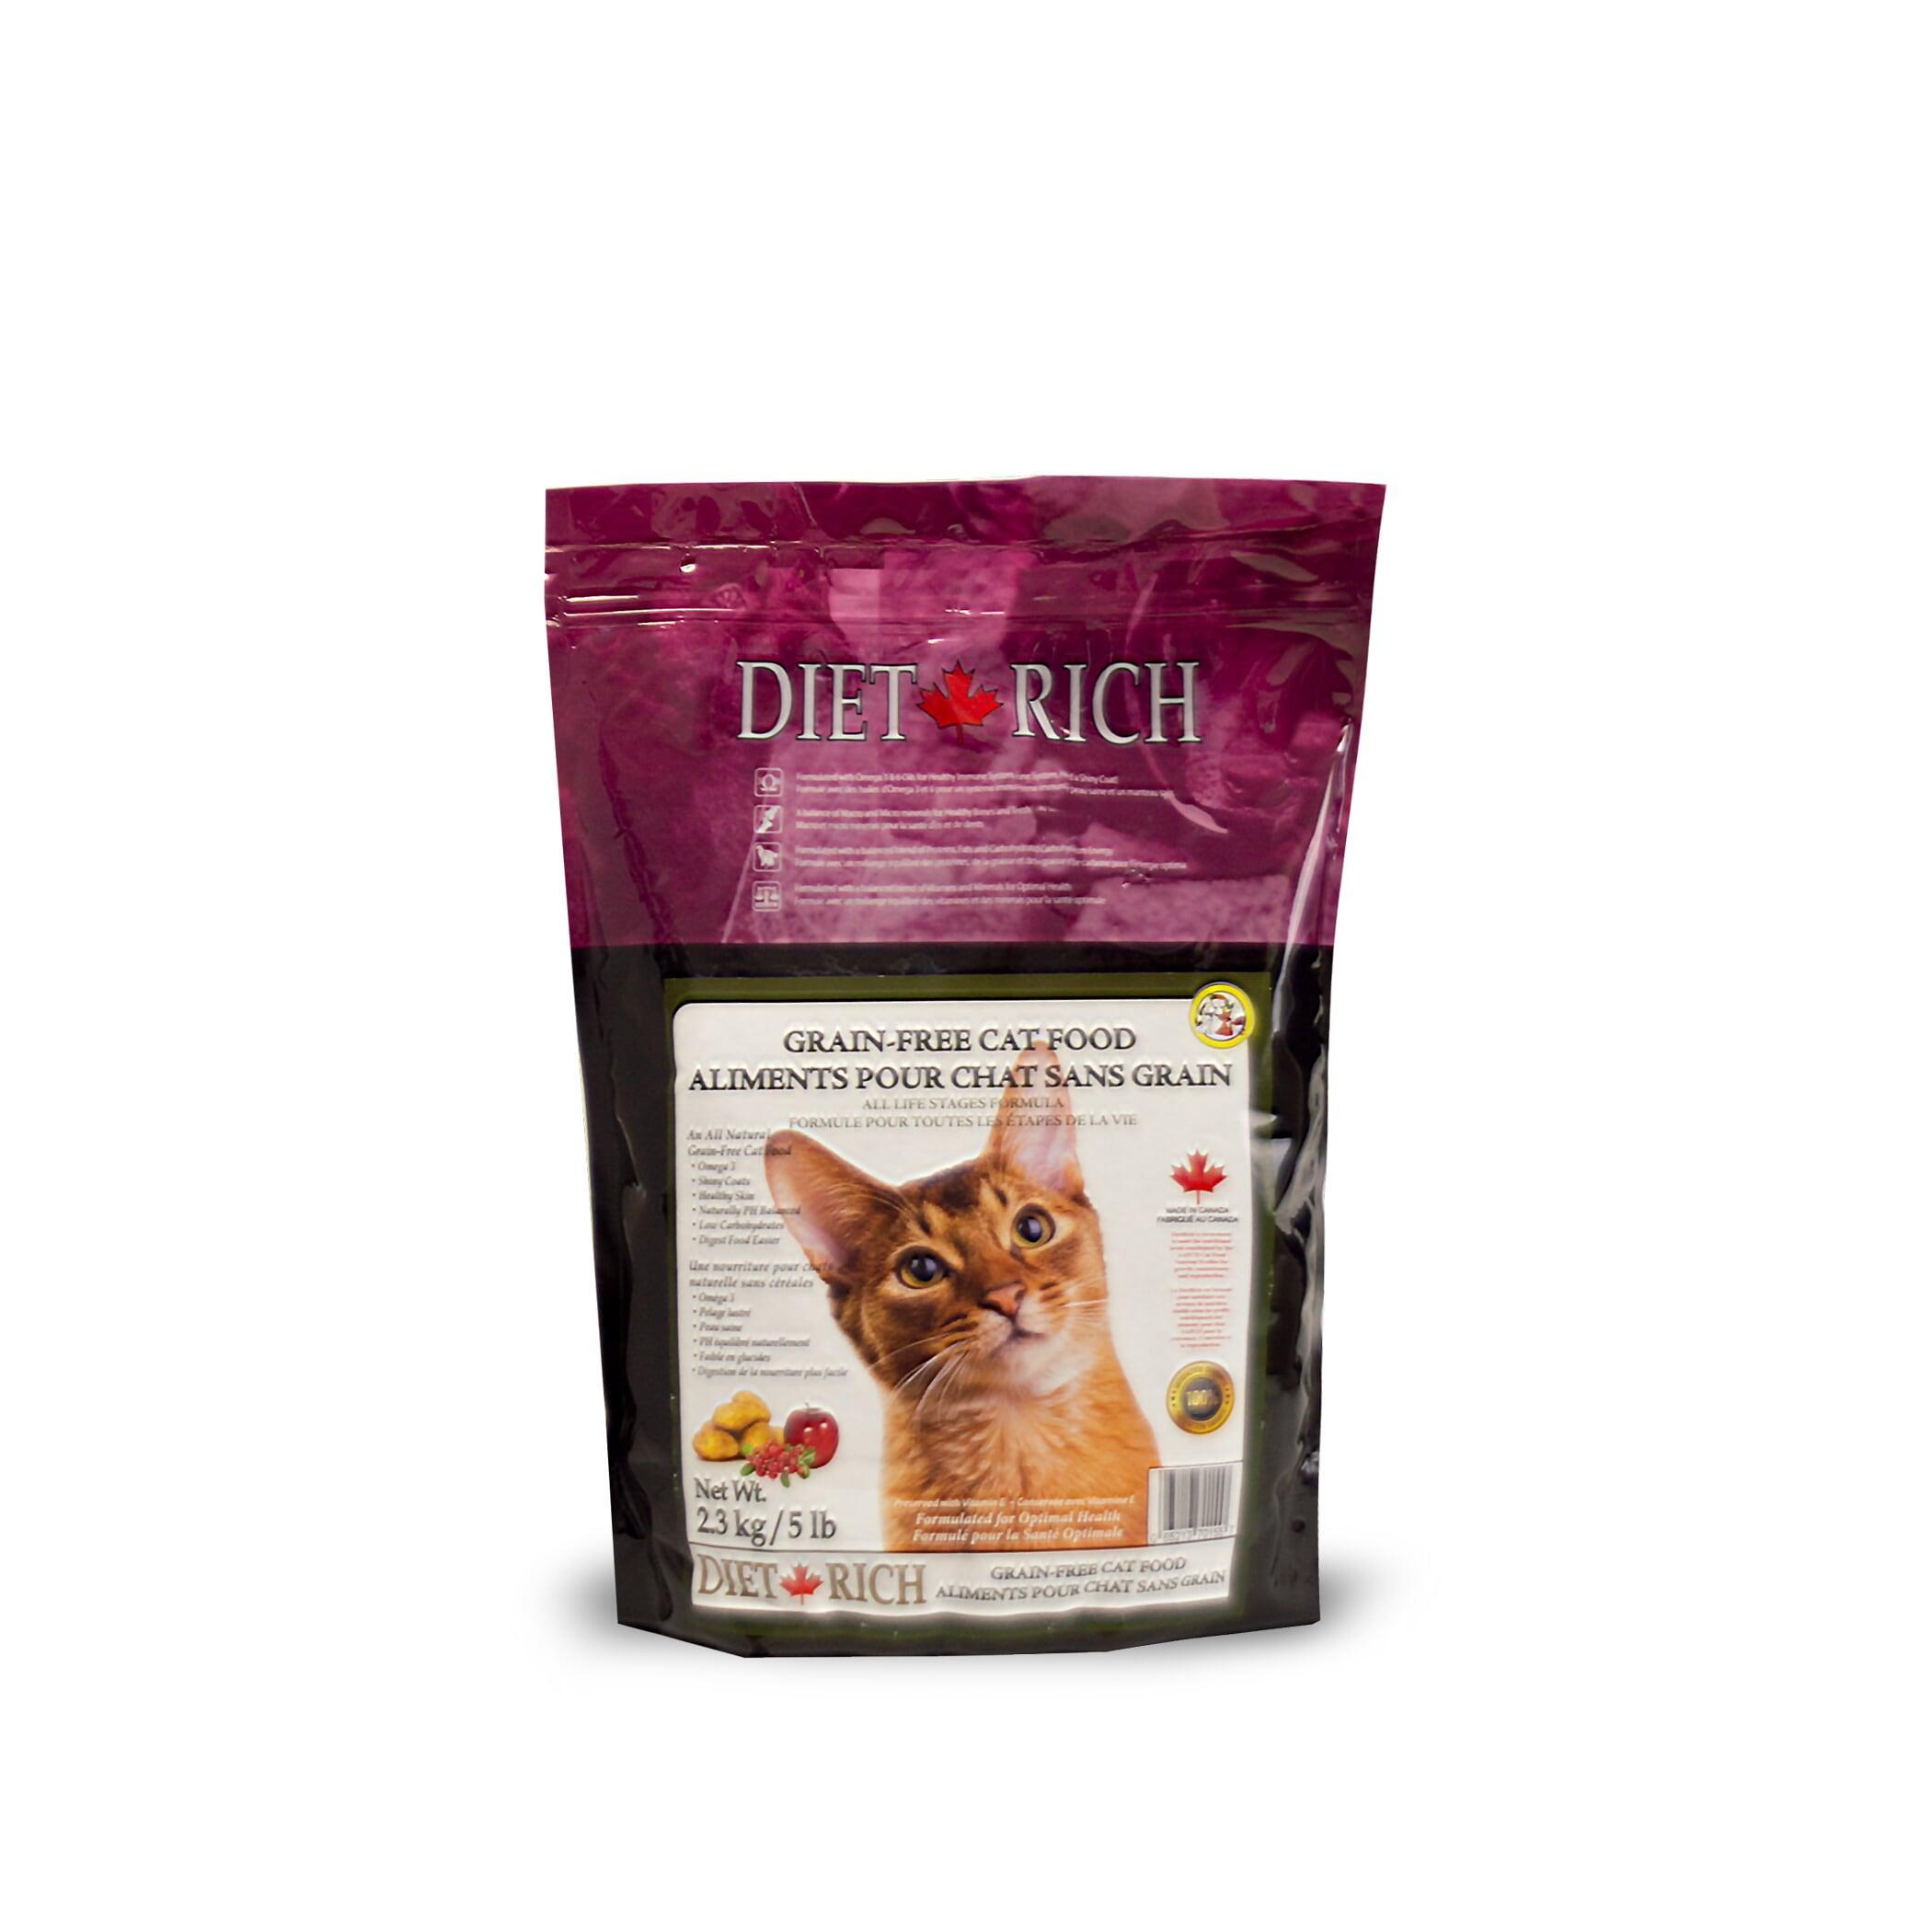 Dietrich Grain-Free Dry Cat Food Image